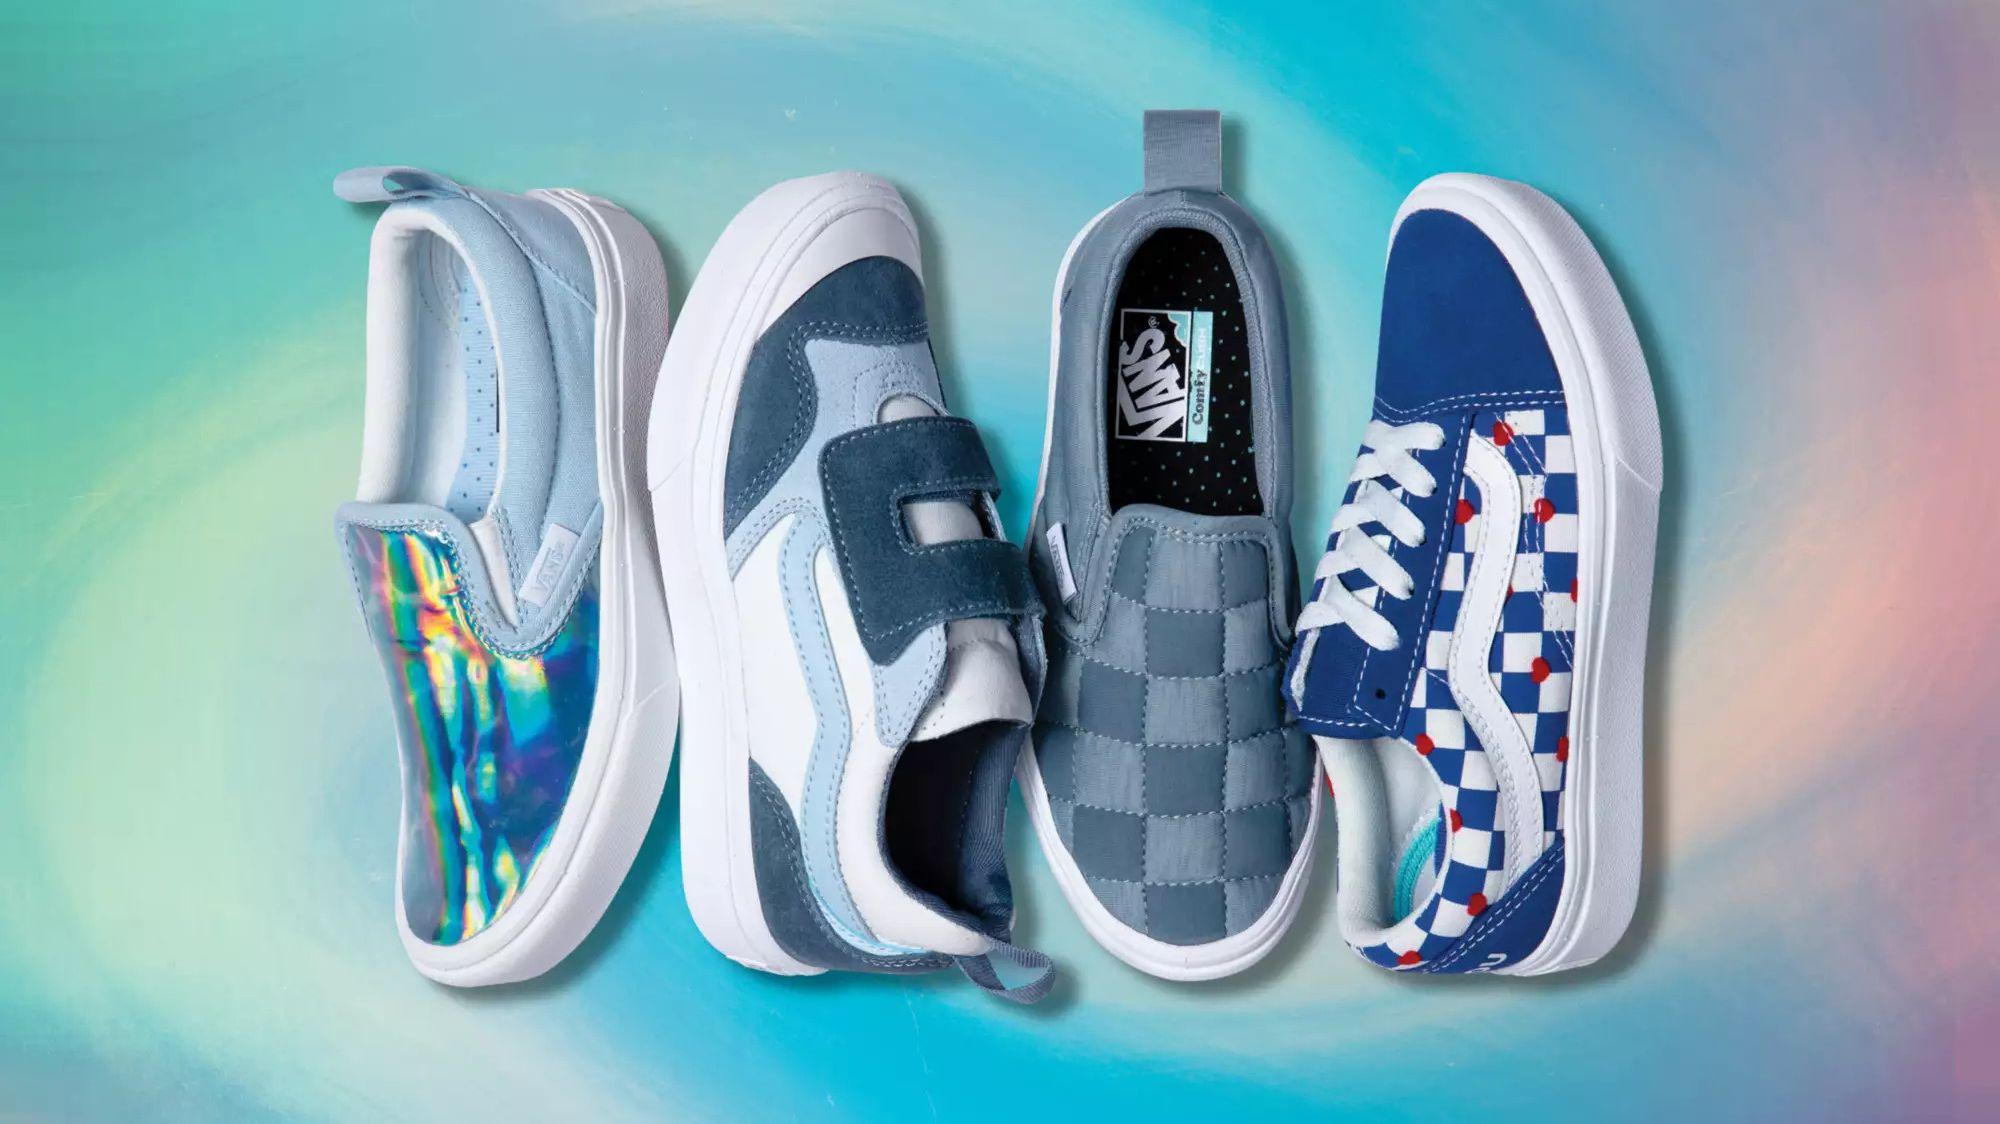 Vans's New Autism Awareness Sneaker Collection Features Sensory-Inclusive Elements